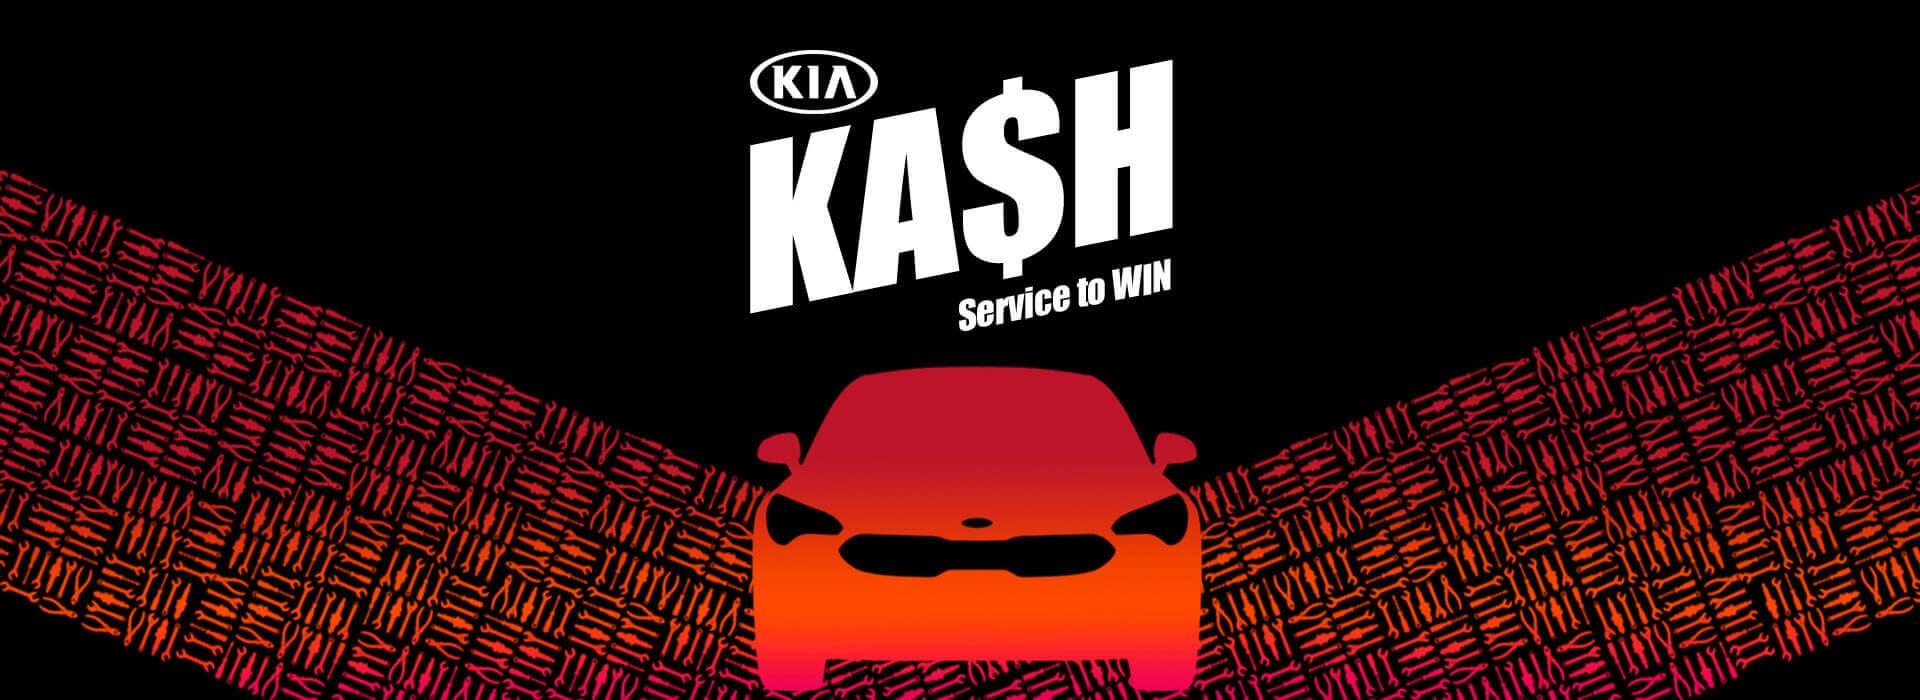 Kia Kash